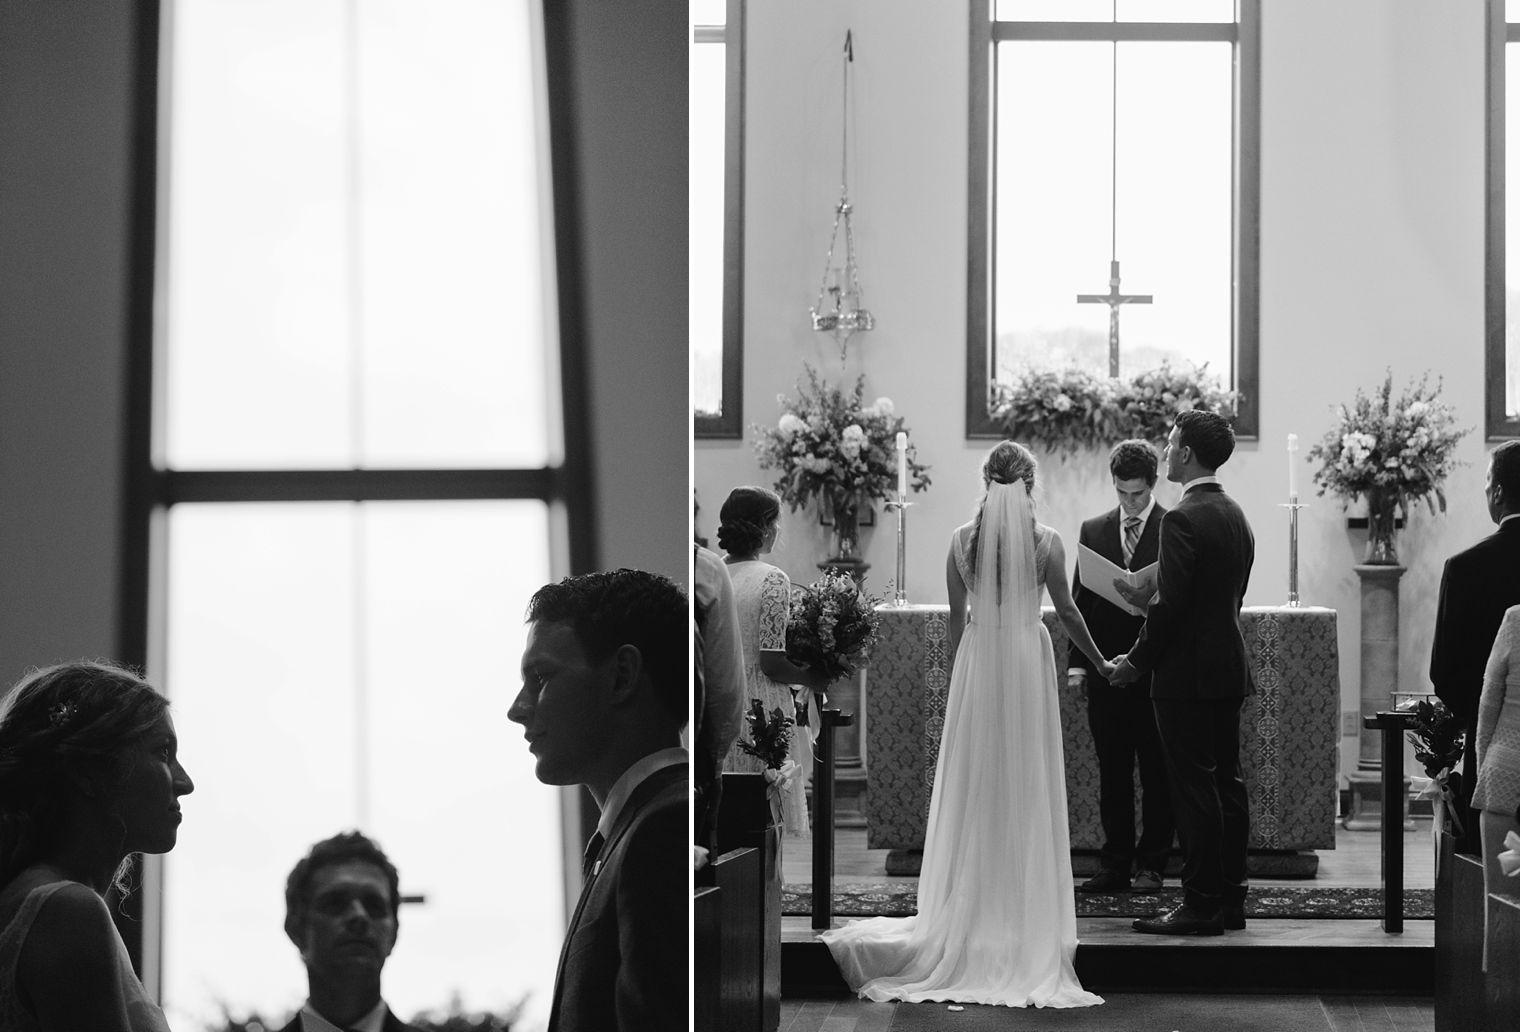 church wedding ceremony in wisconsin